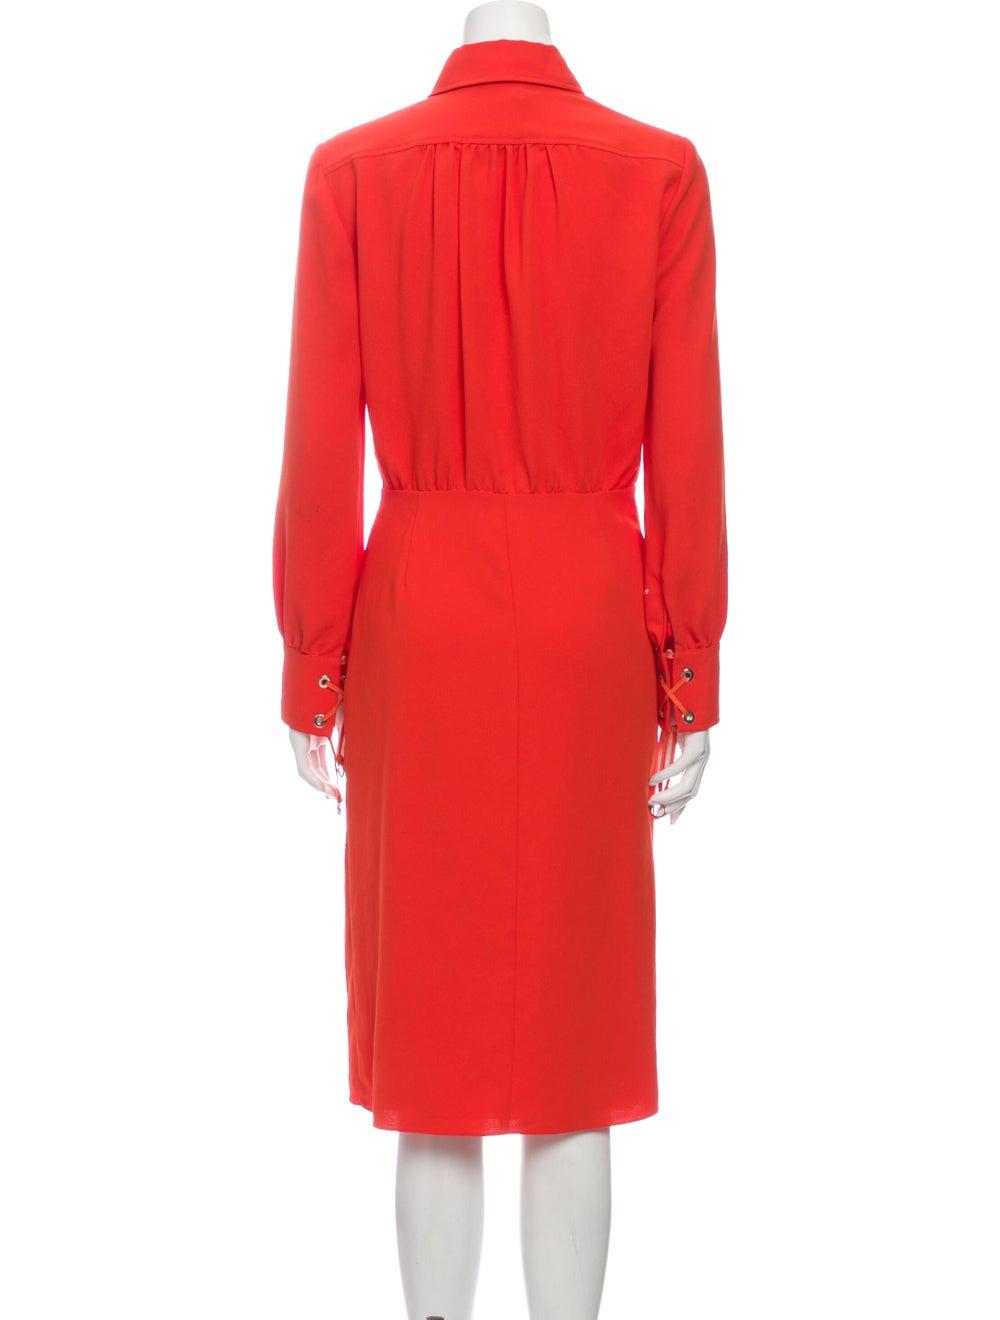 Altuzarra Midi Length Dress Orange - image 3